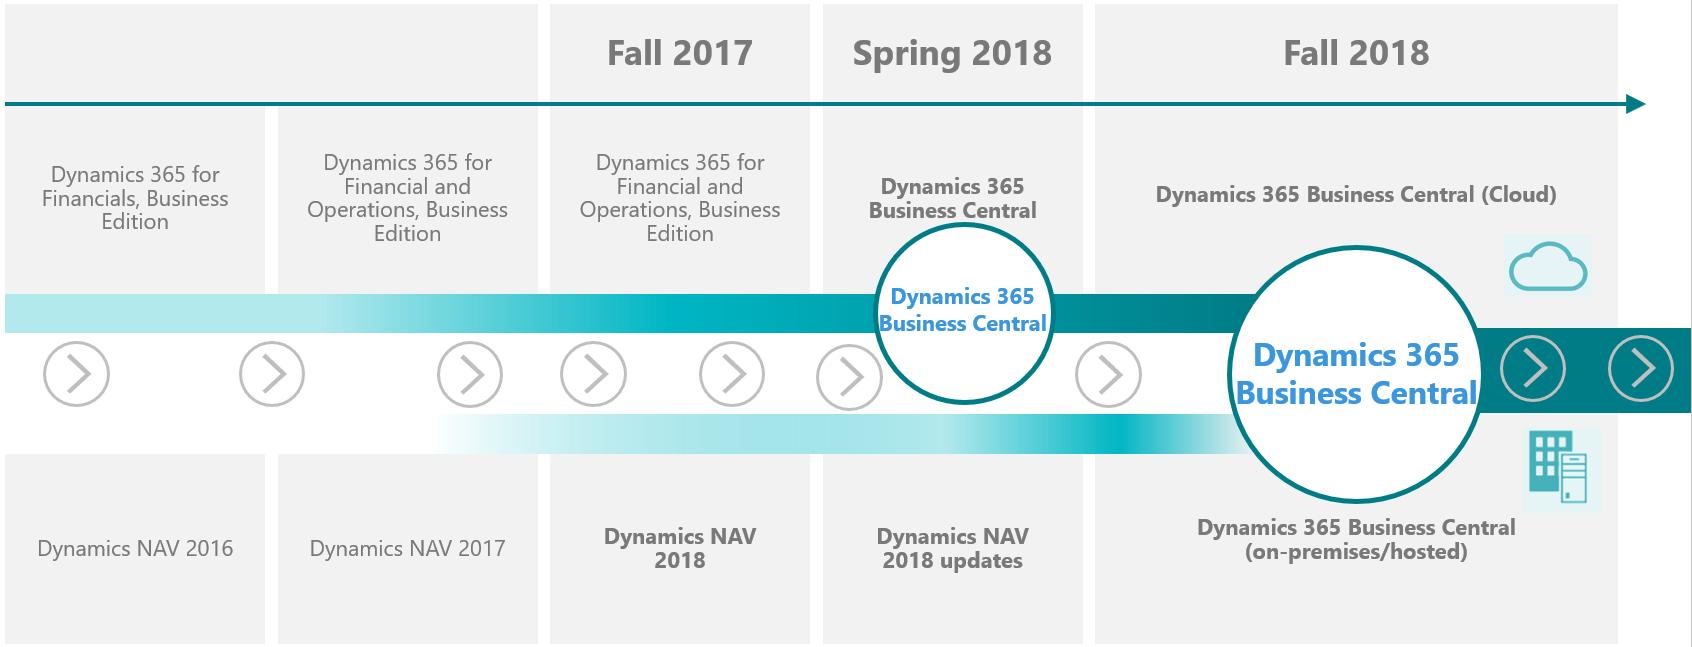 Dynamics 365 Business Central Roadmap Totovic Dynamics Blog